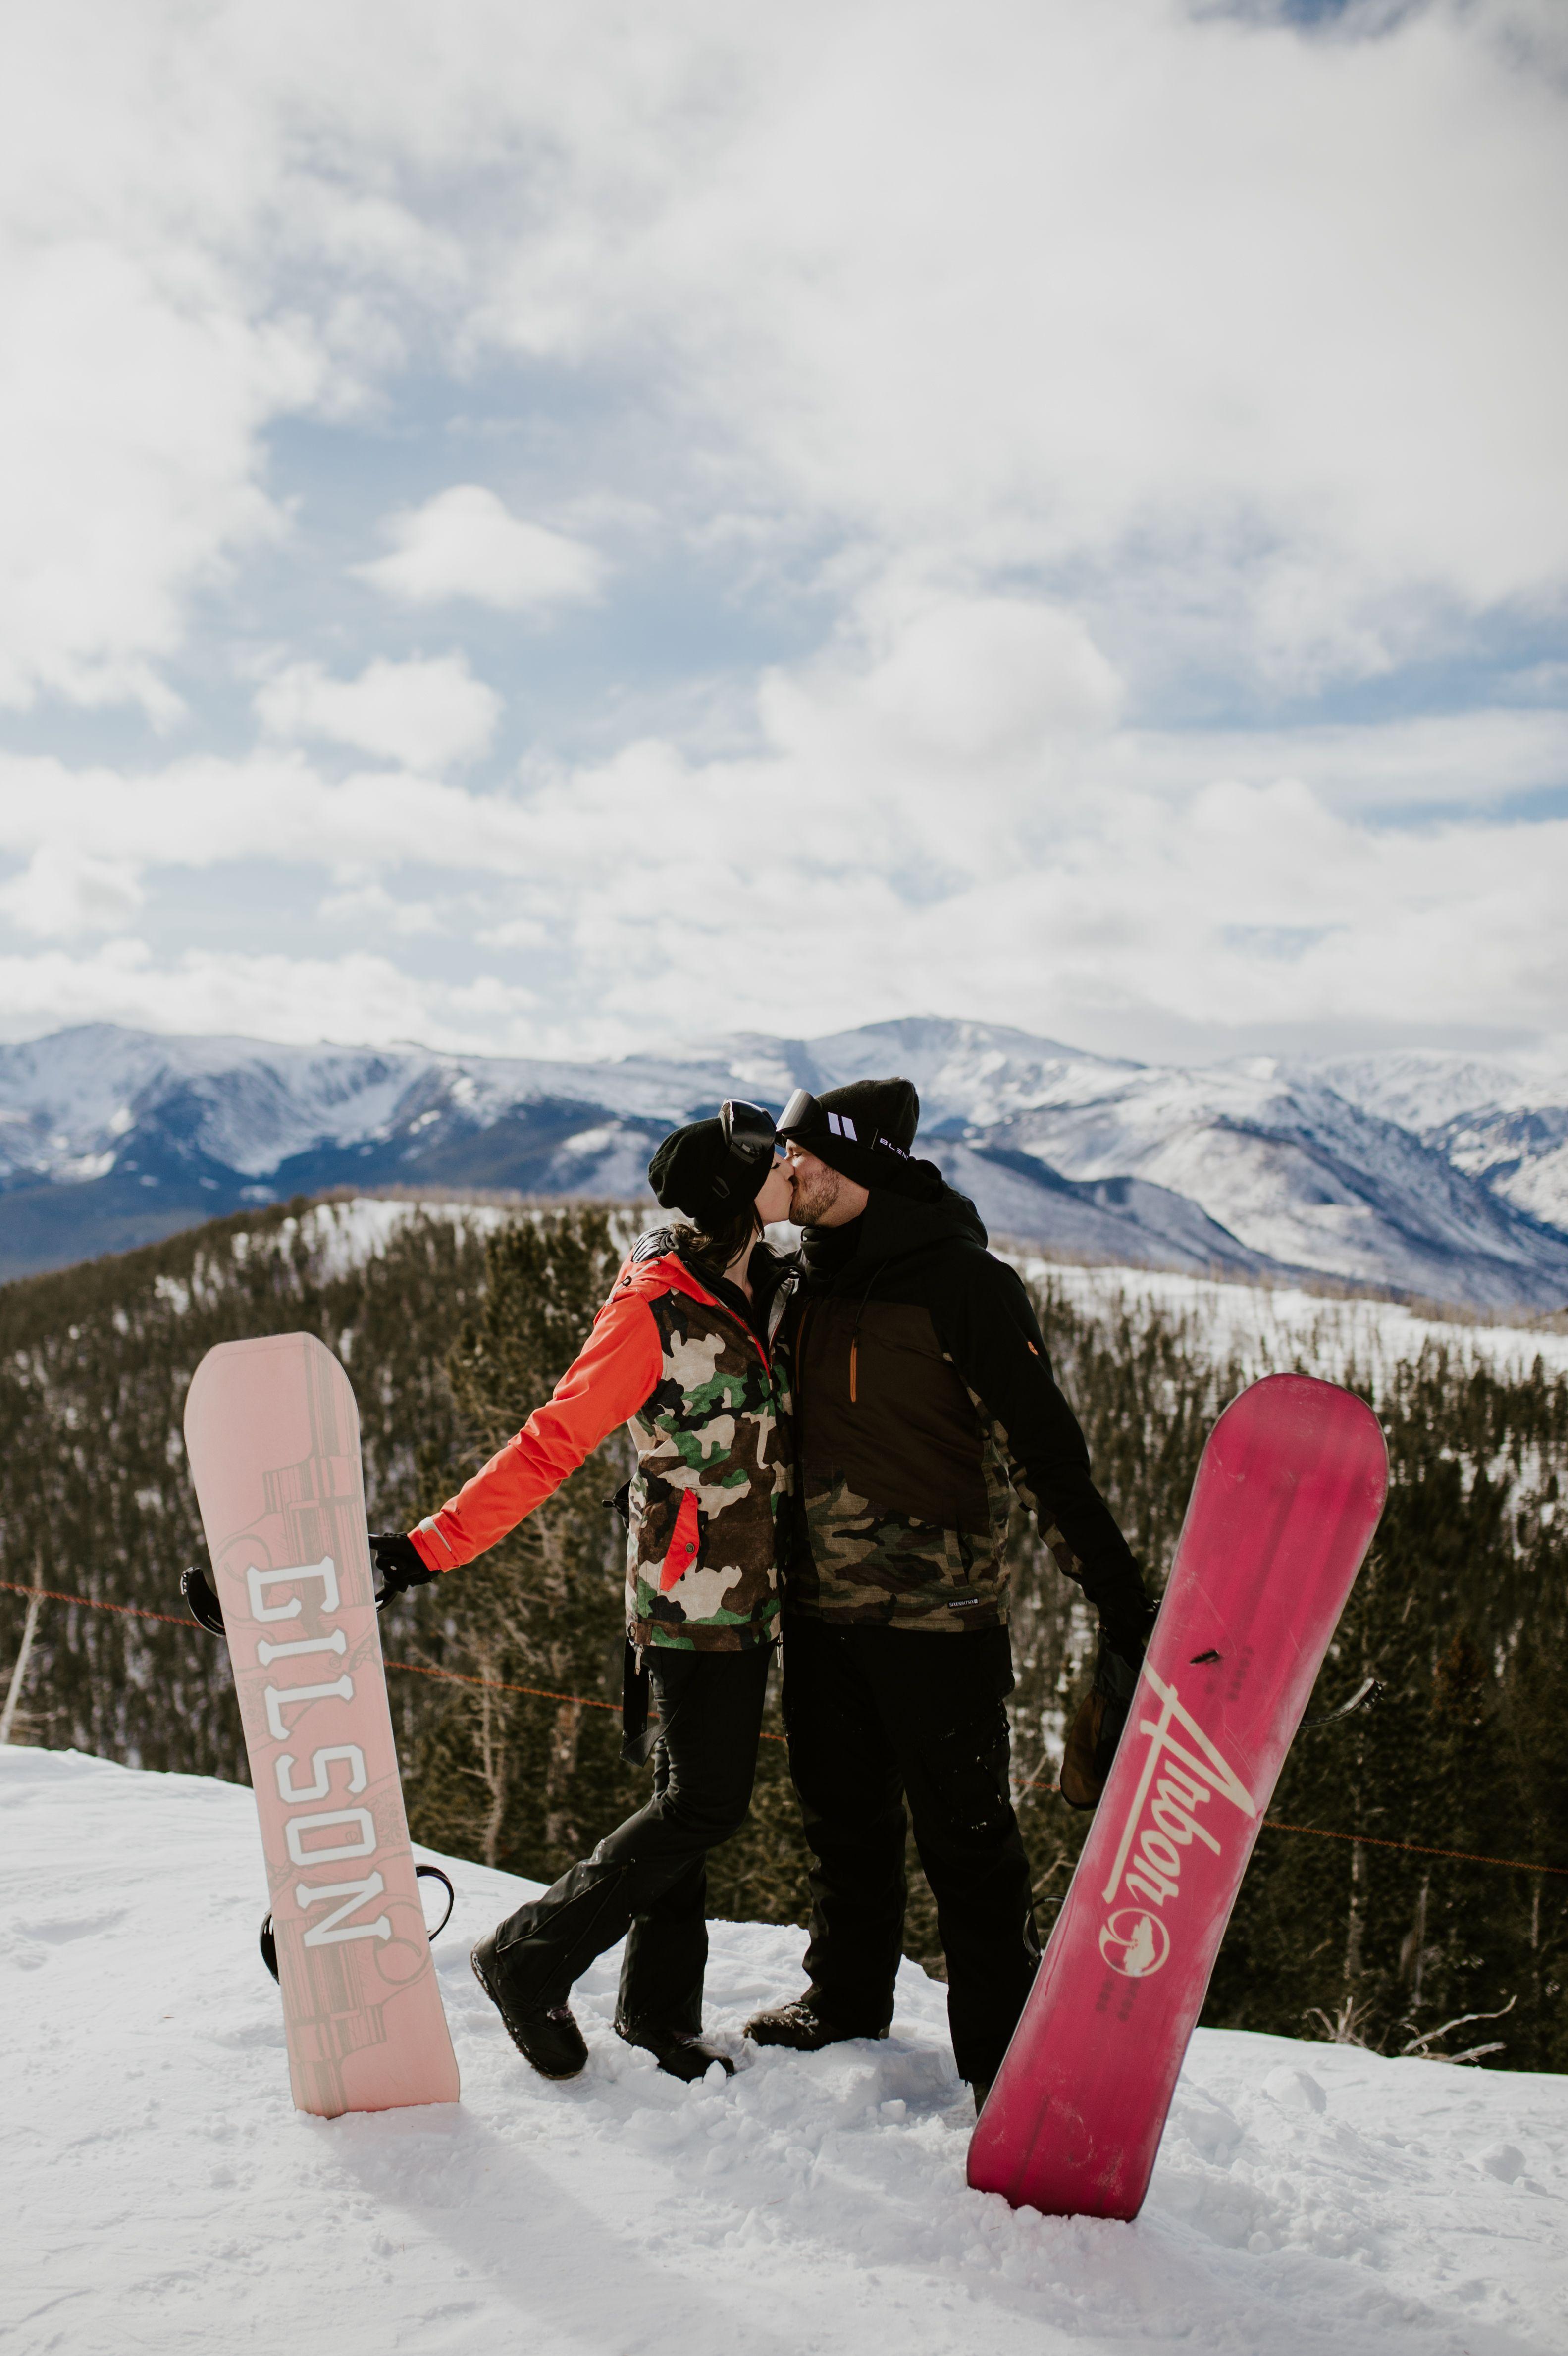 Salomon Man's Board 2015 2016 Snowboard Review